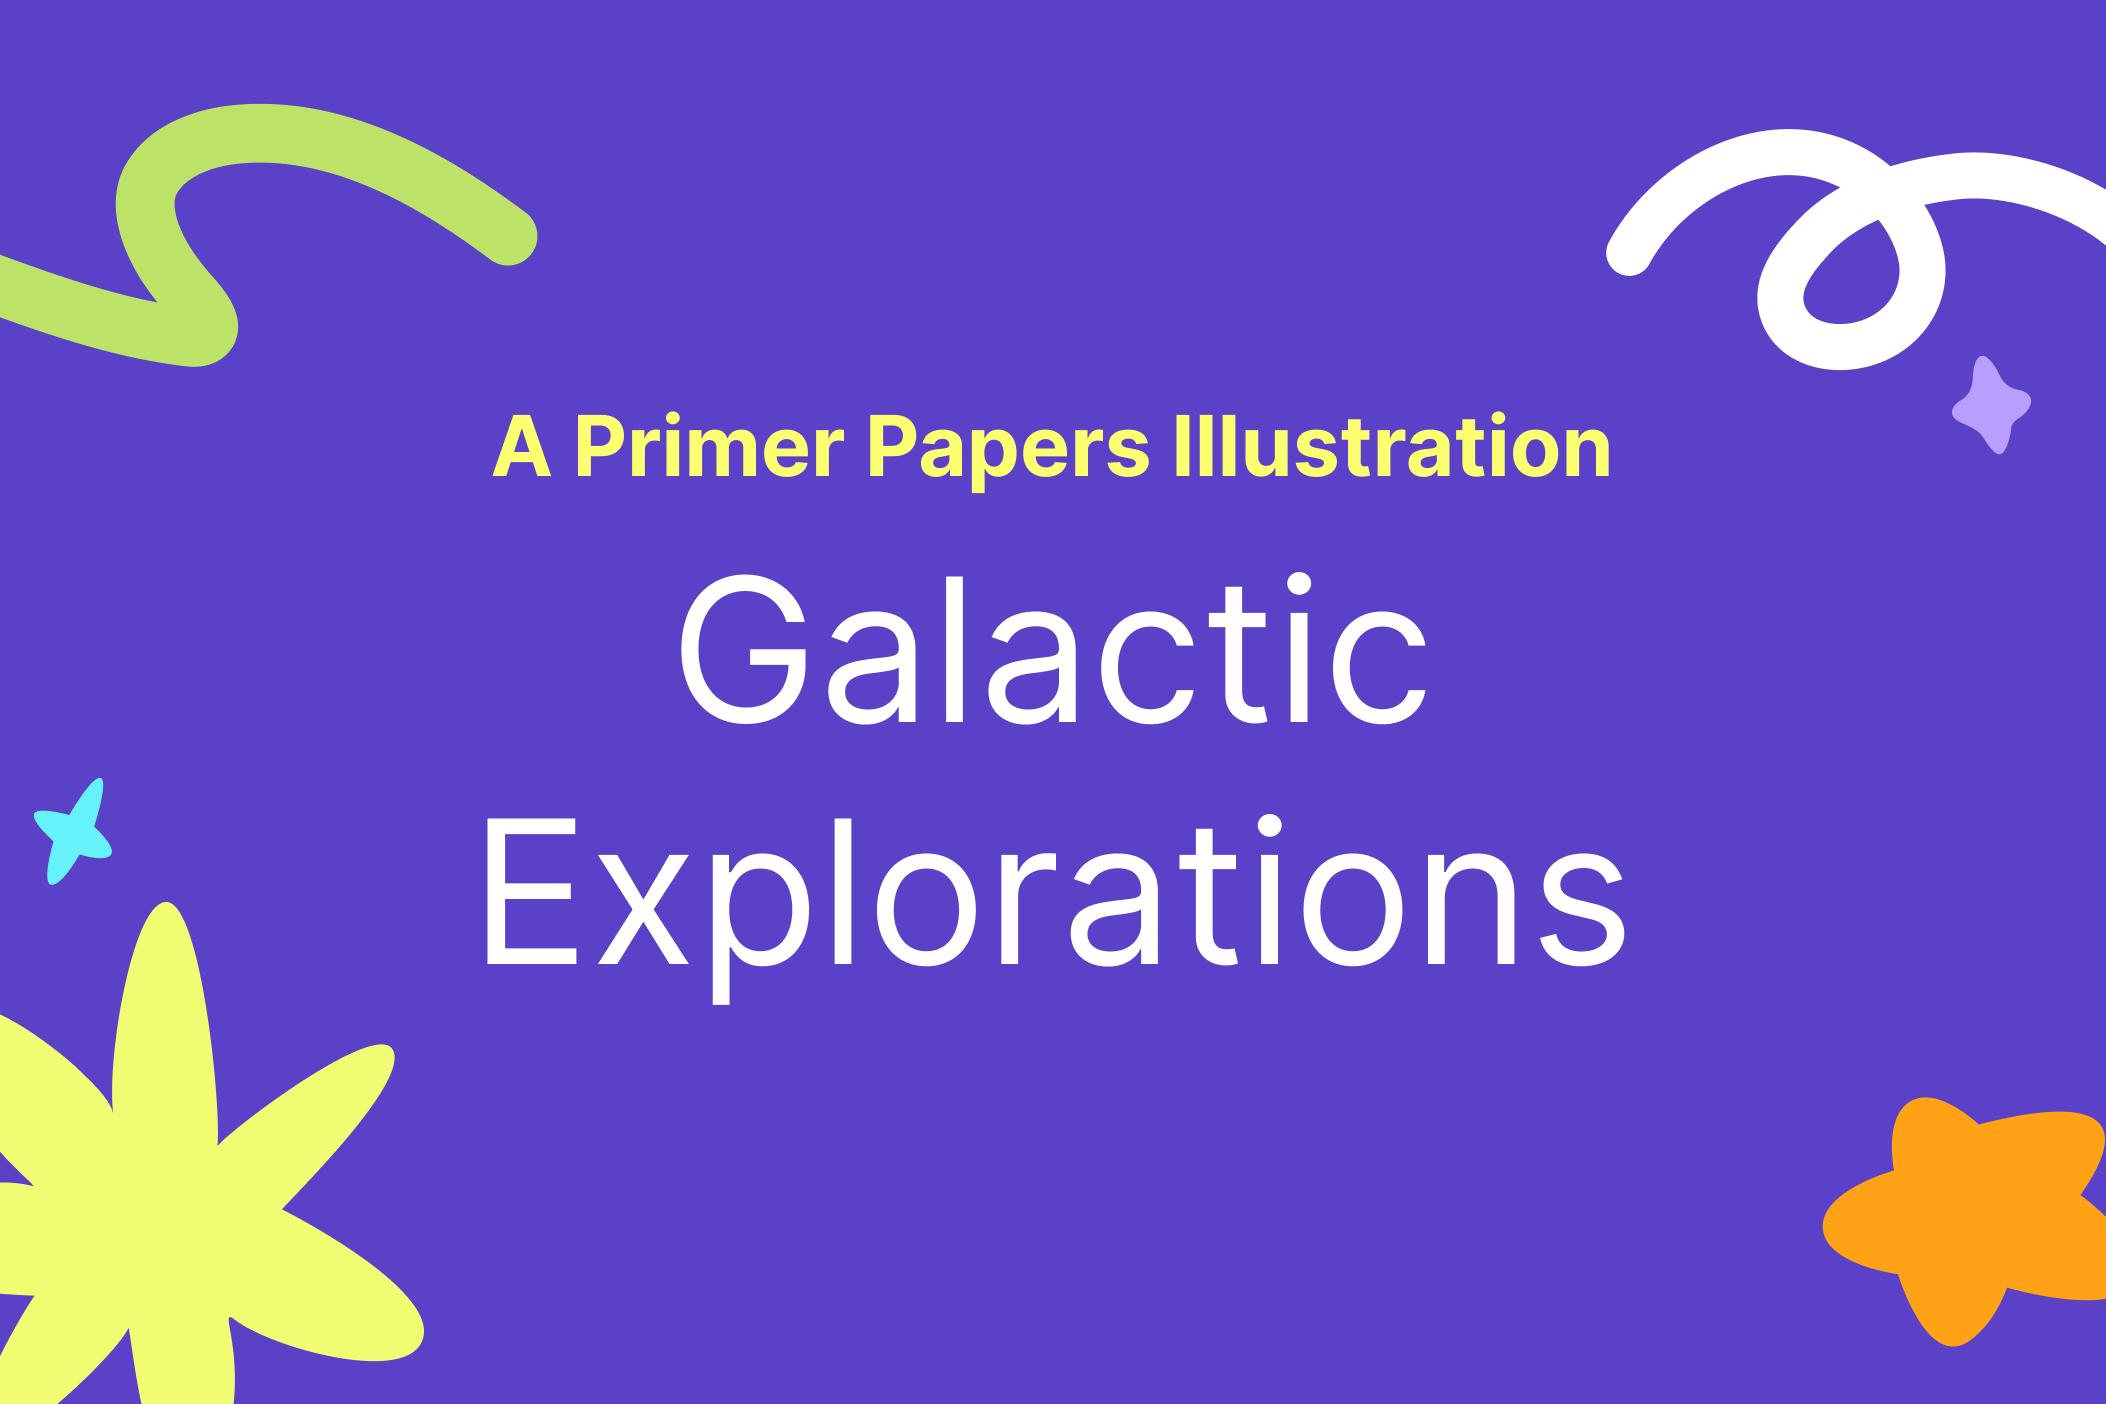 A Galactic Explorations Digital Illustration by Sierra